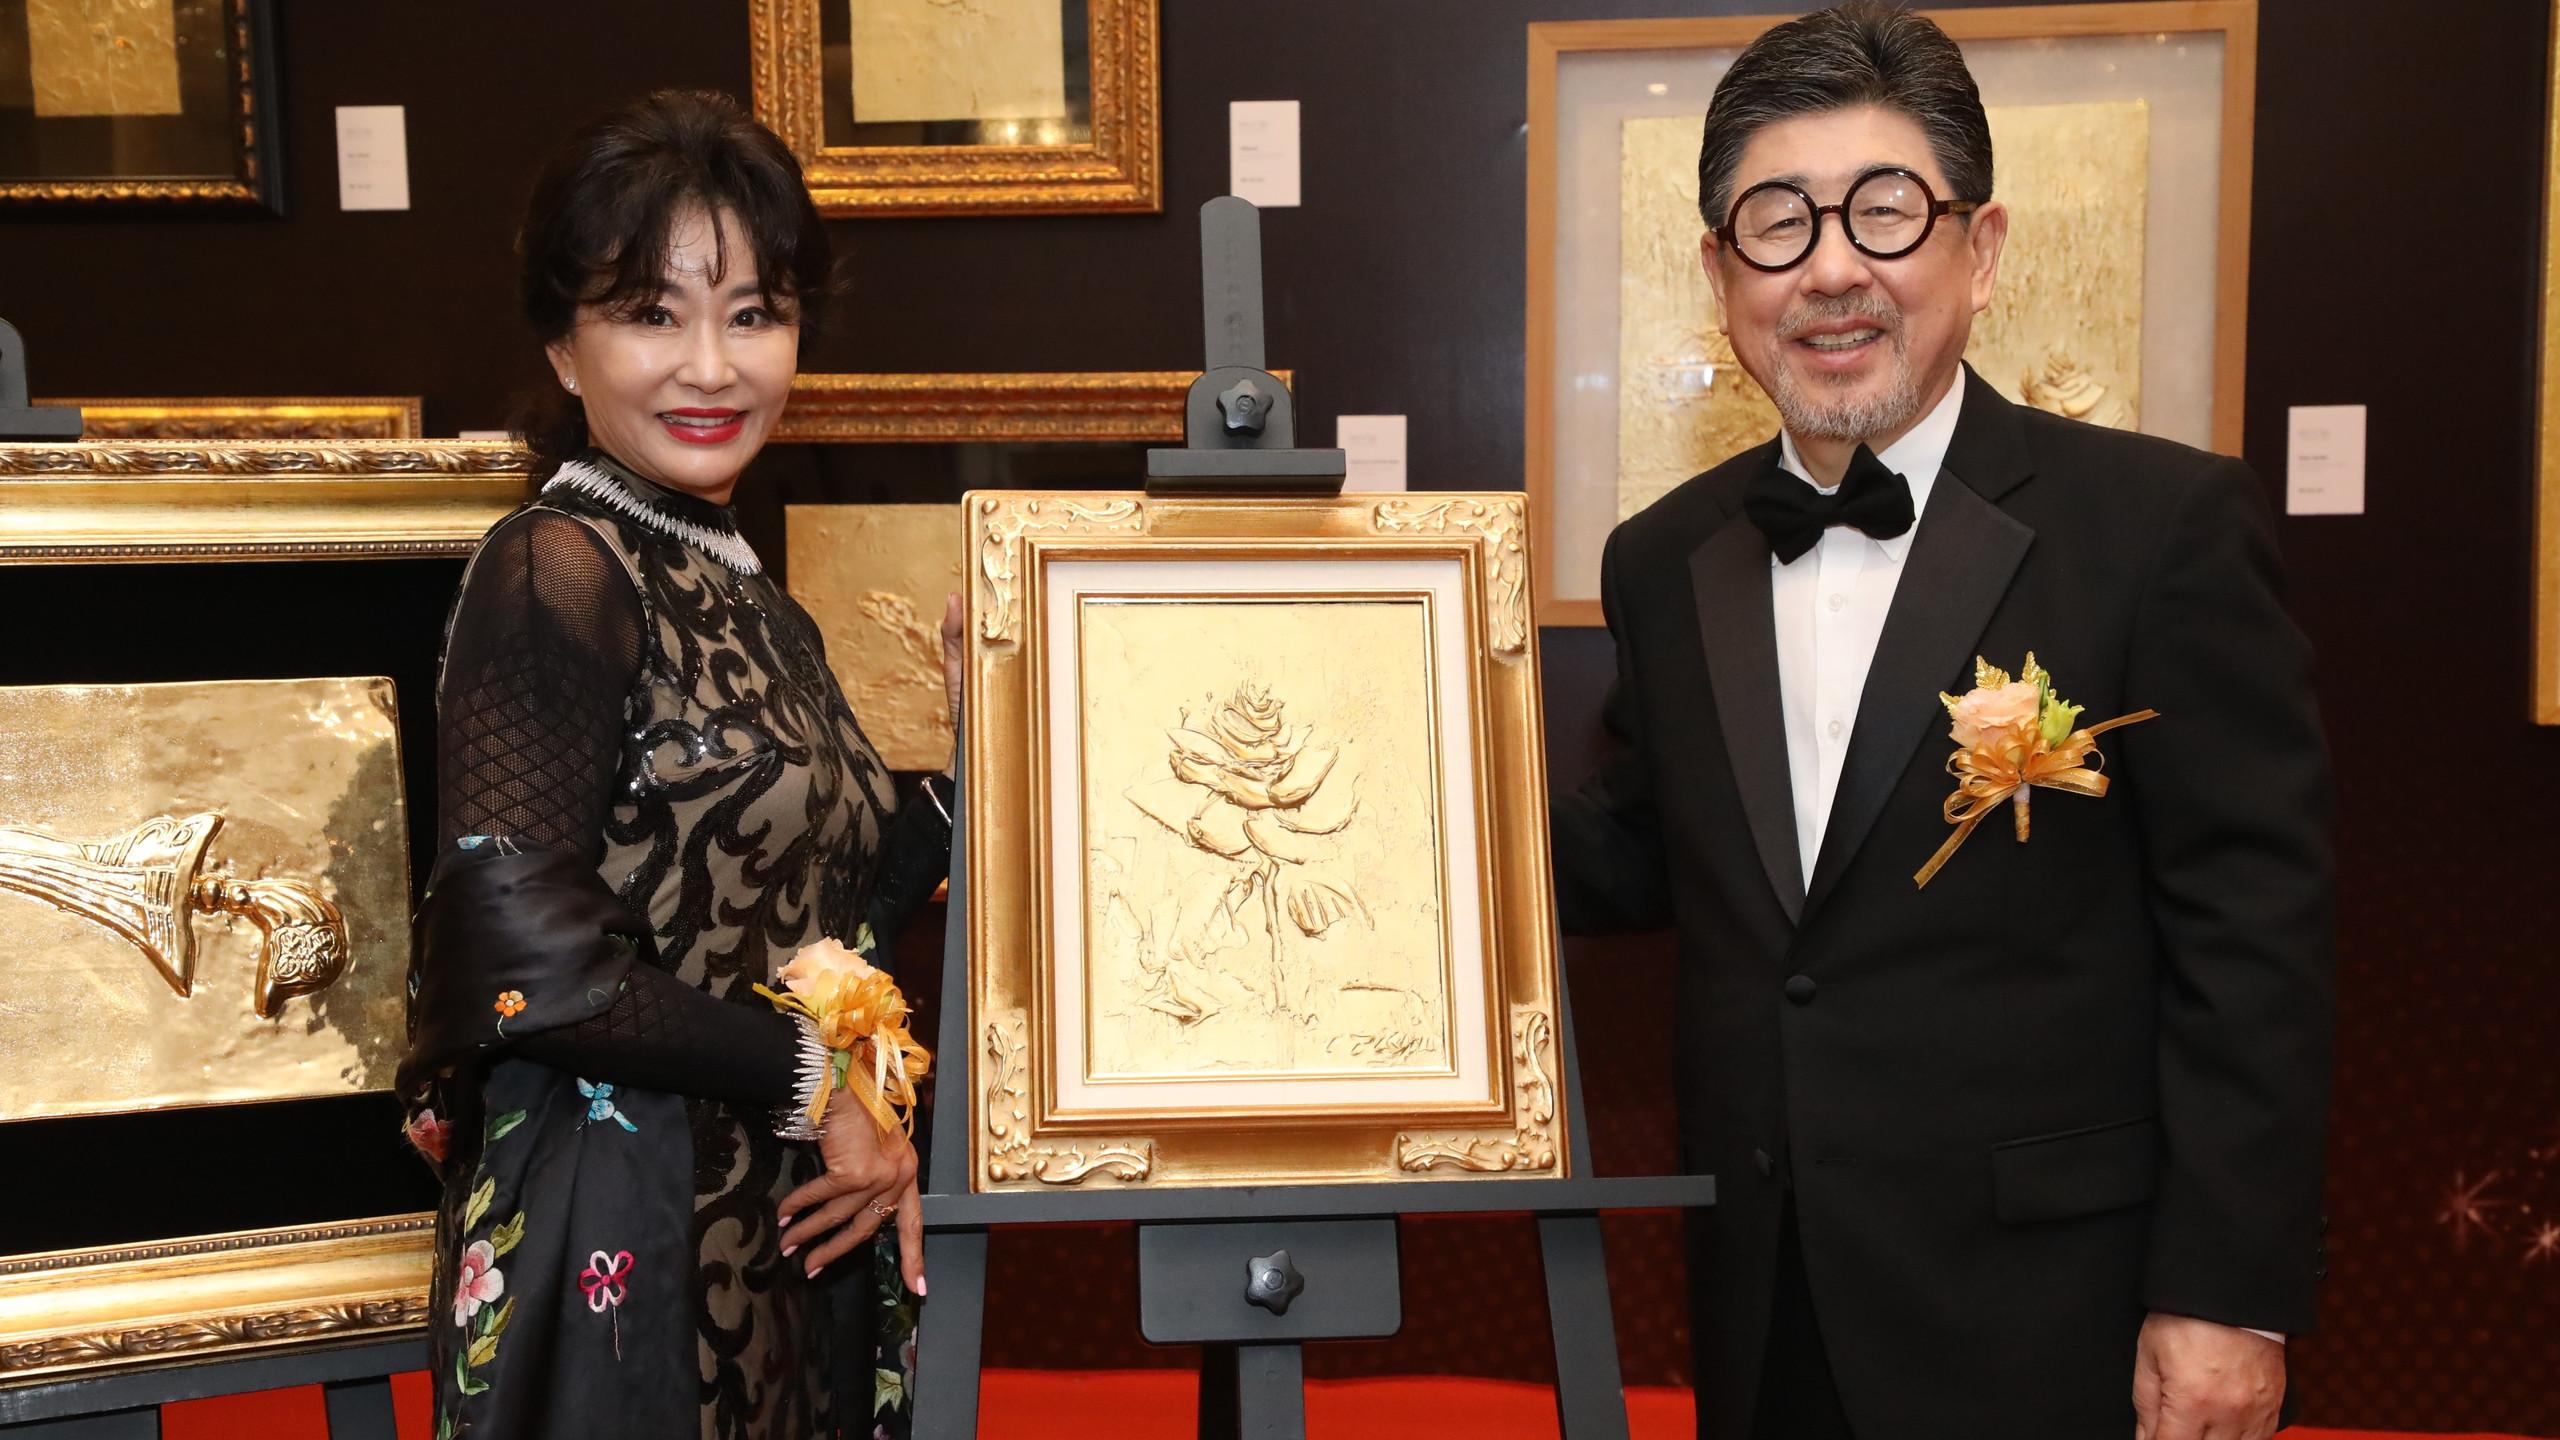 Jin Mi Ryang and Kim Il Tae